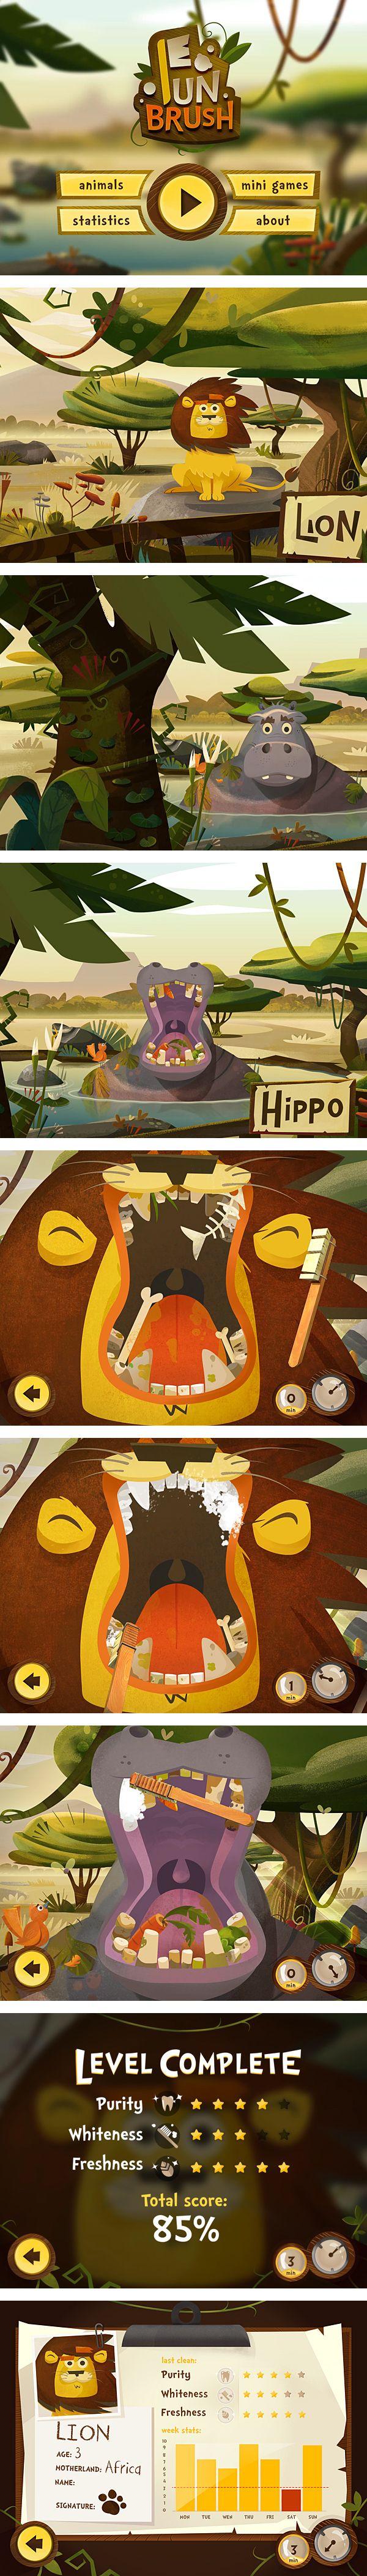 animation for FunBrush. #animals